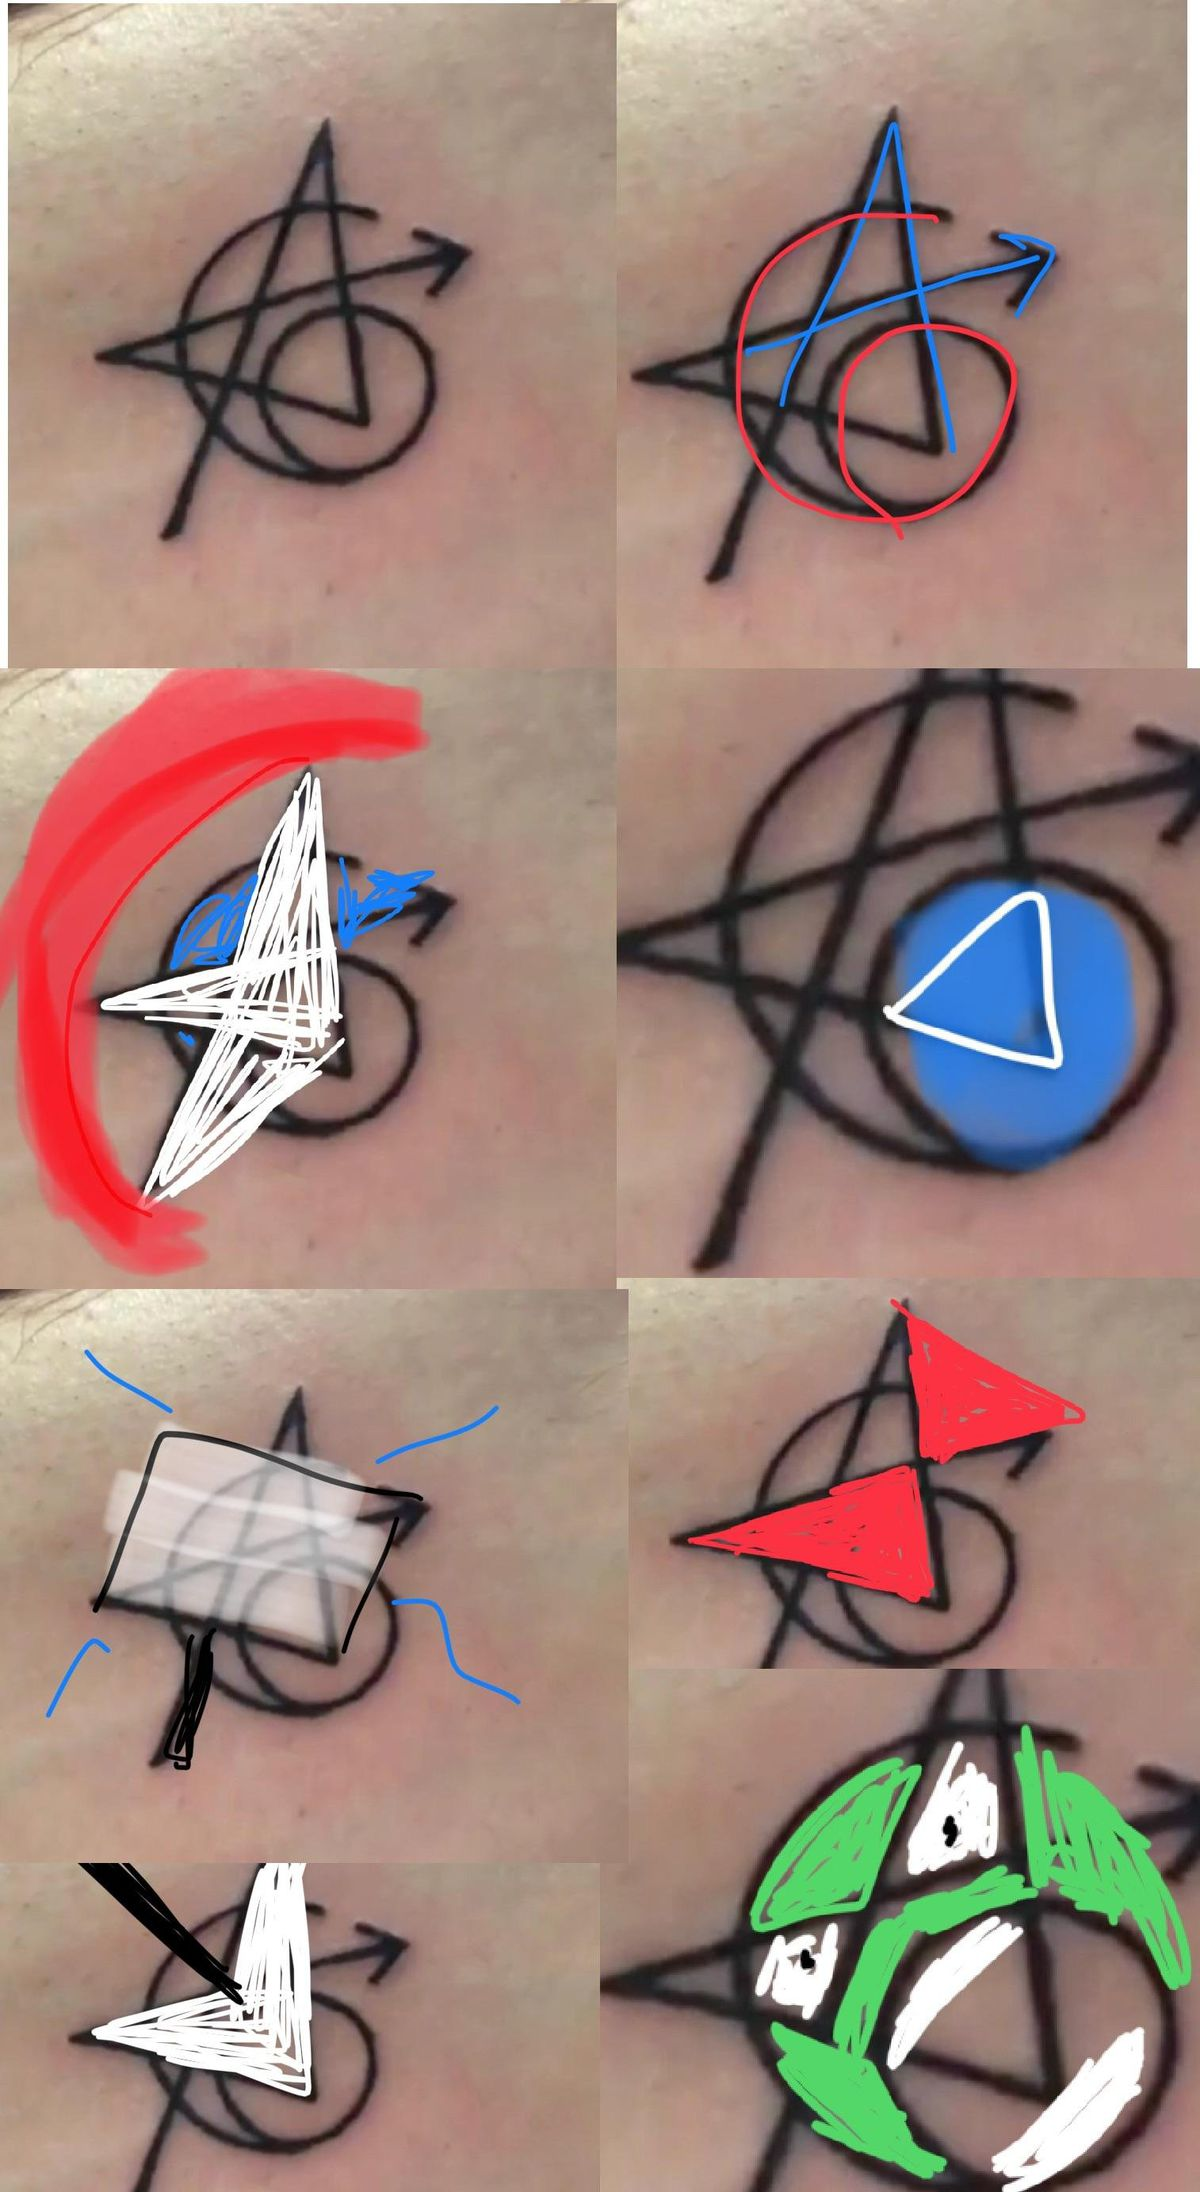 Original 6 Avengers Tattoo : original, avengers, tattoo, Avengers:, Infinity, Matching, Tattoos—with, Secret, Symbols?, Polygon